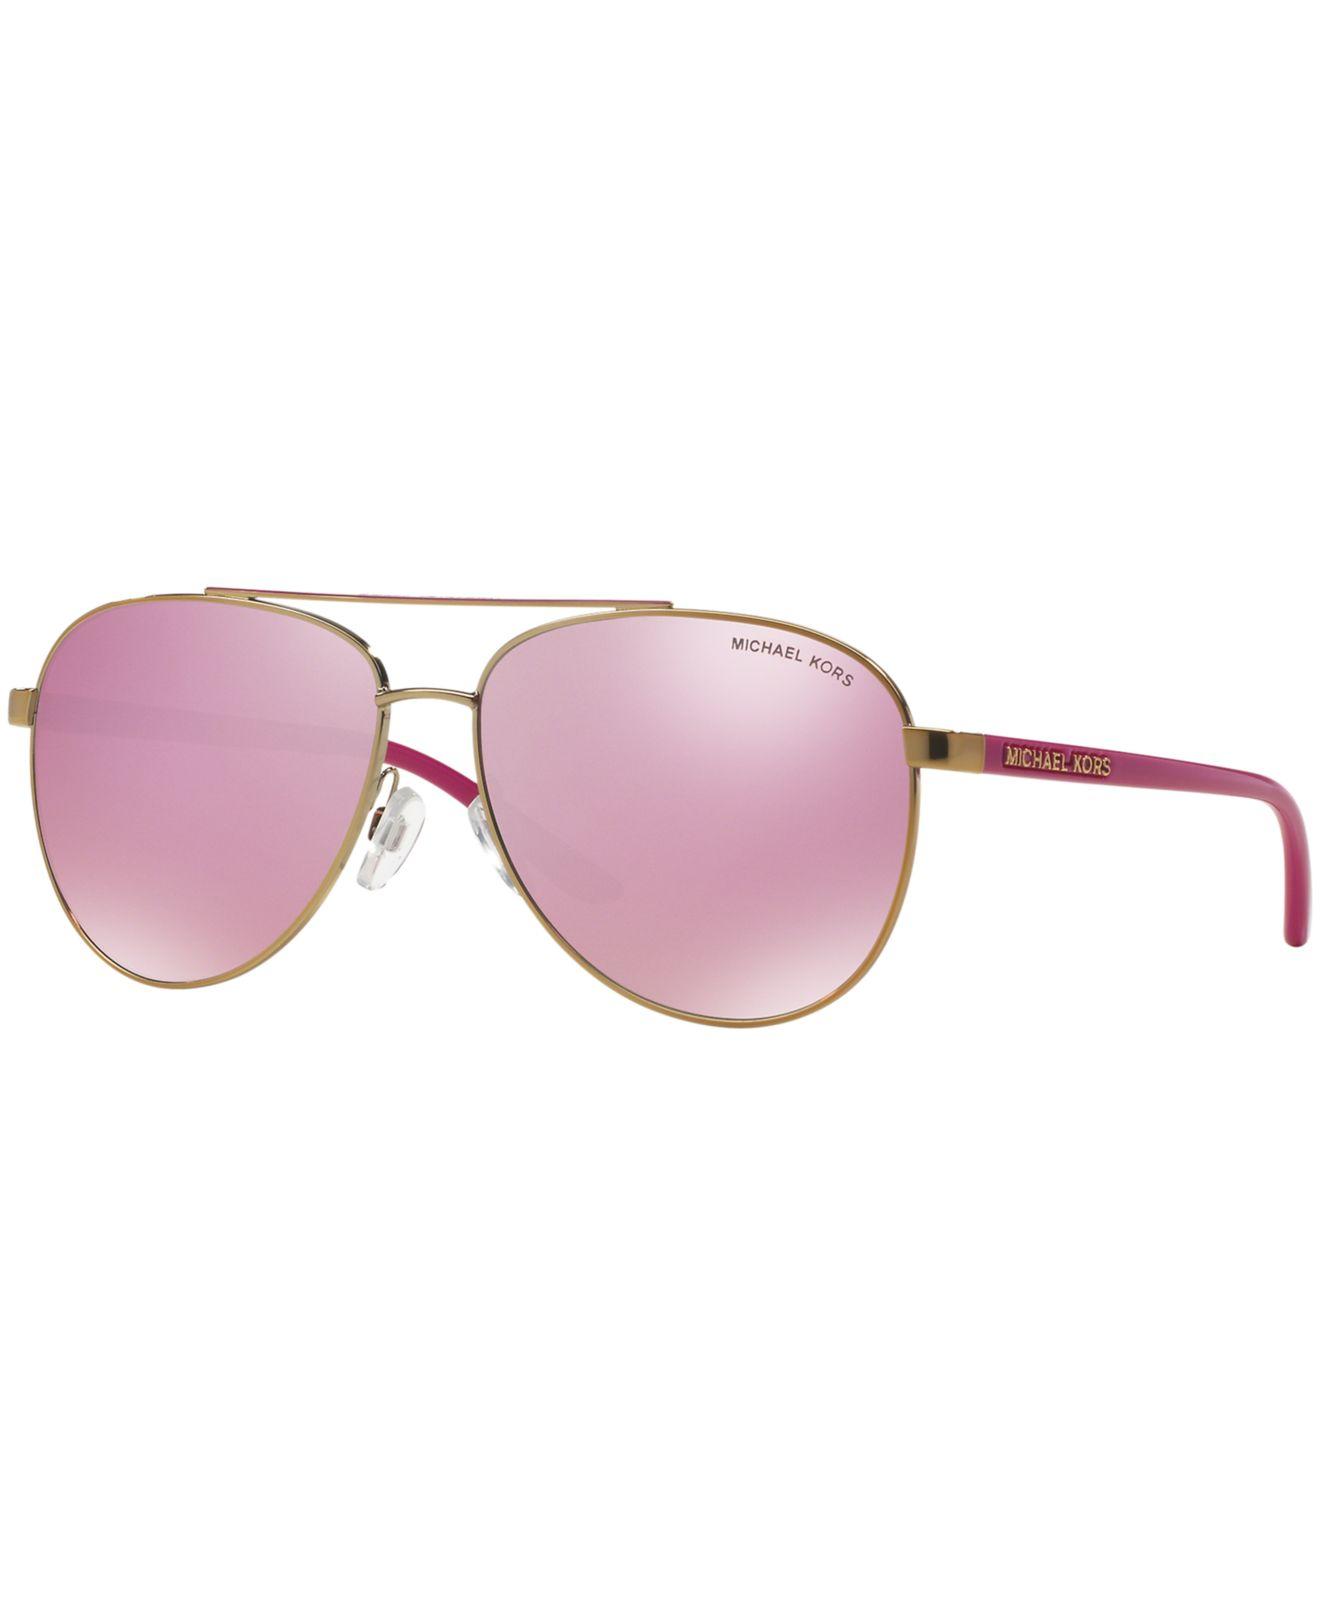 3bd83f06e893c6 Lyst - Michael Kors Mk5007 59 Hvar in Pink